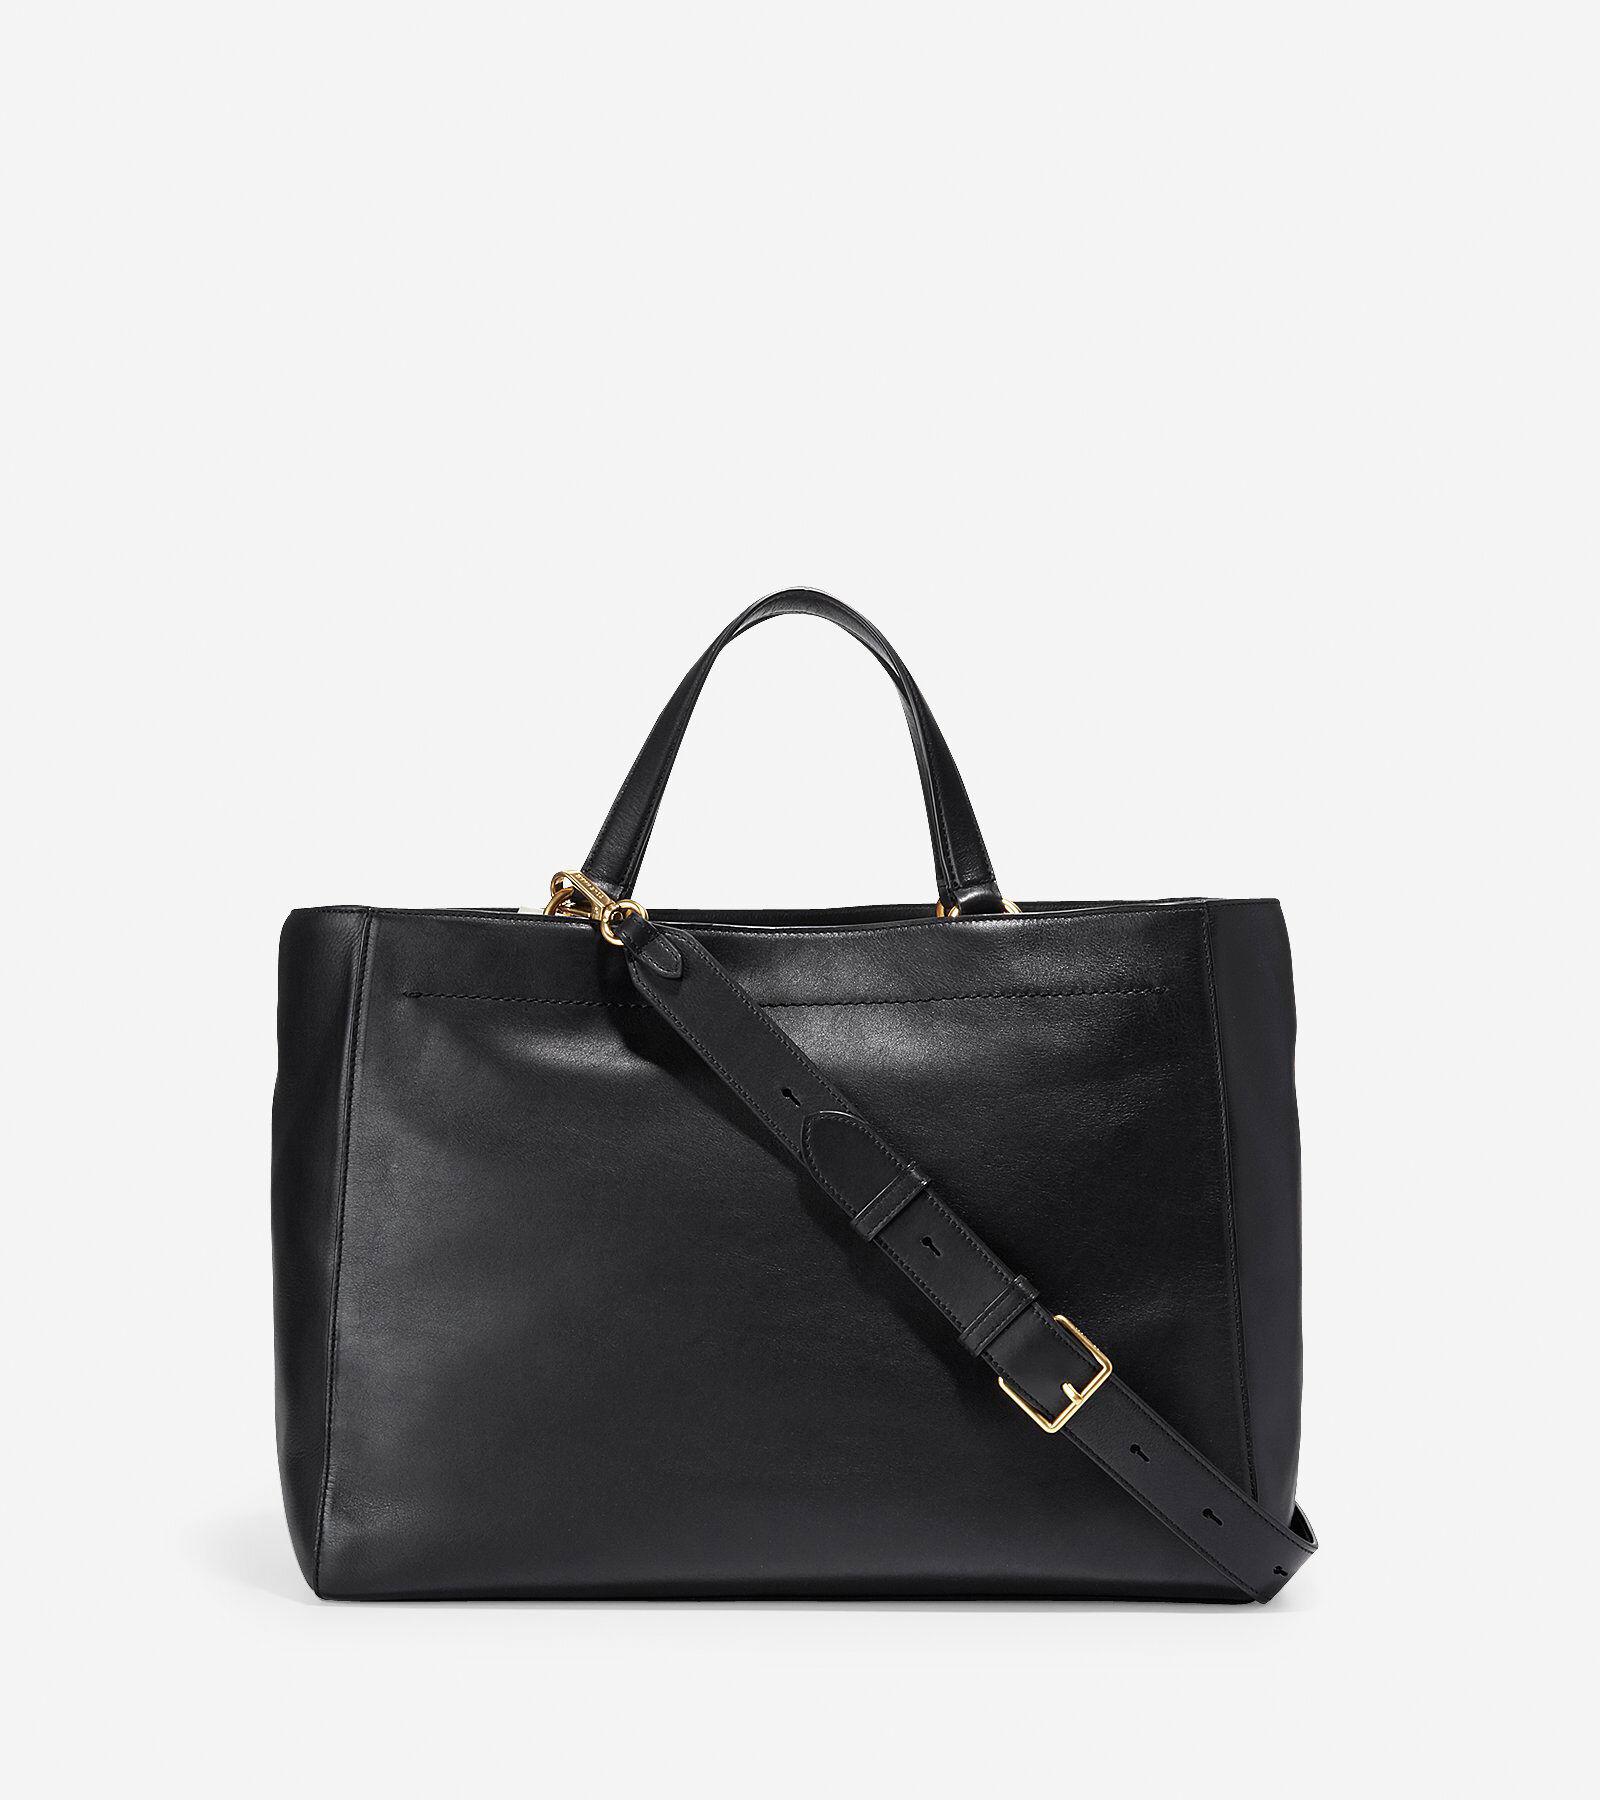 Cole Haan Zoe Work Tote (Black) Tote Handbags mhF9fhOzTS